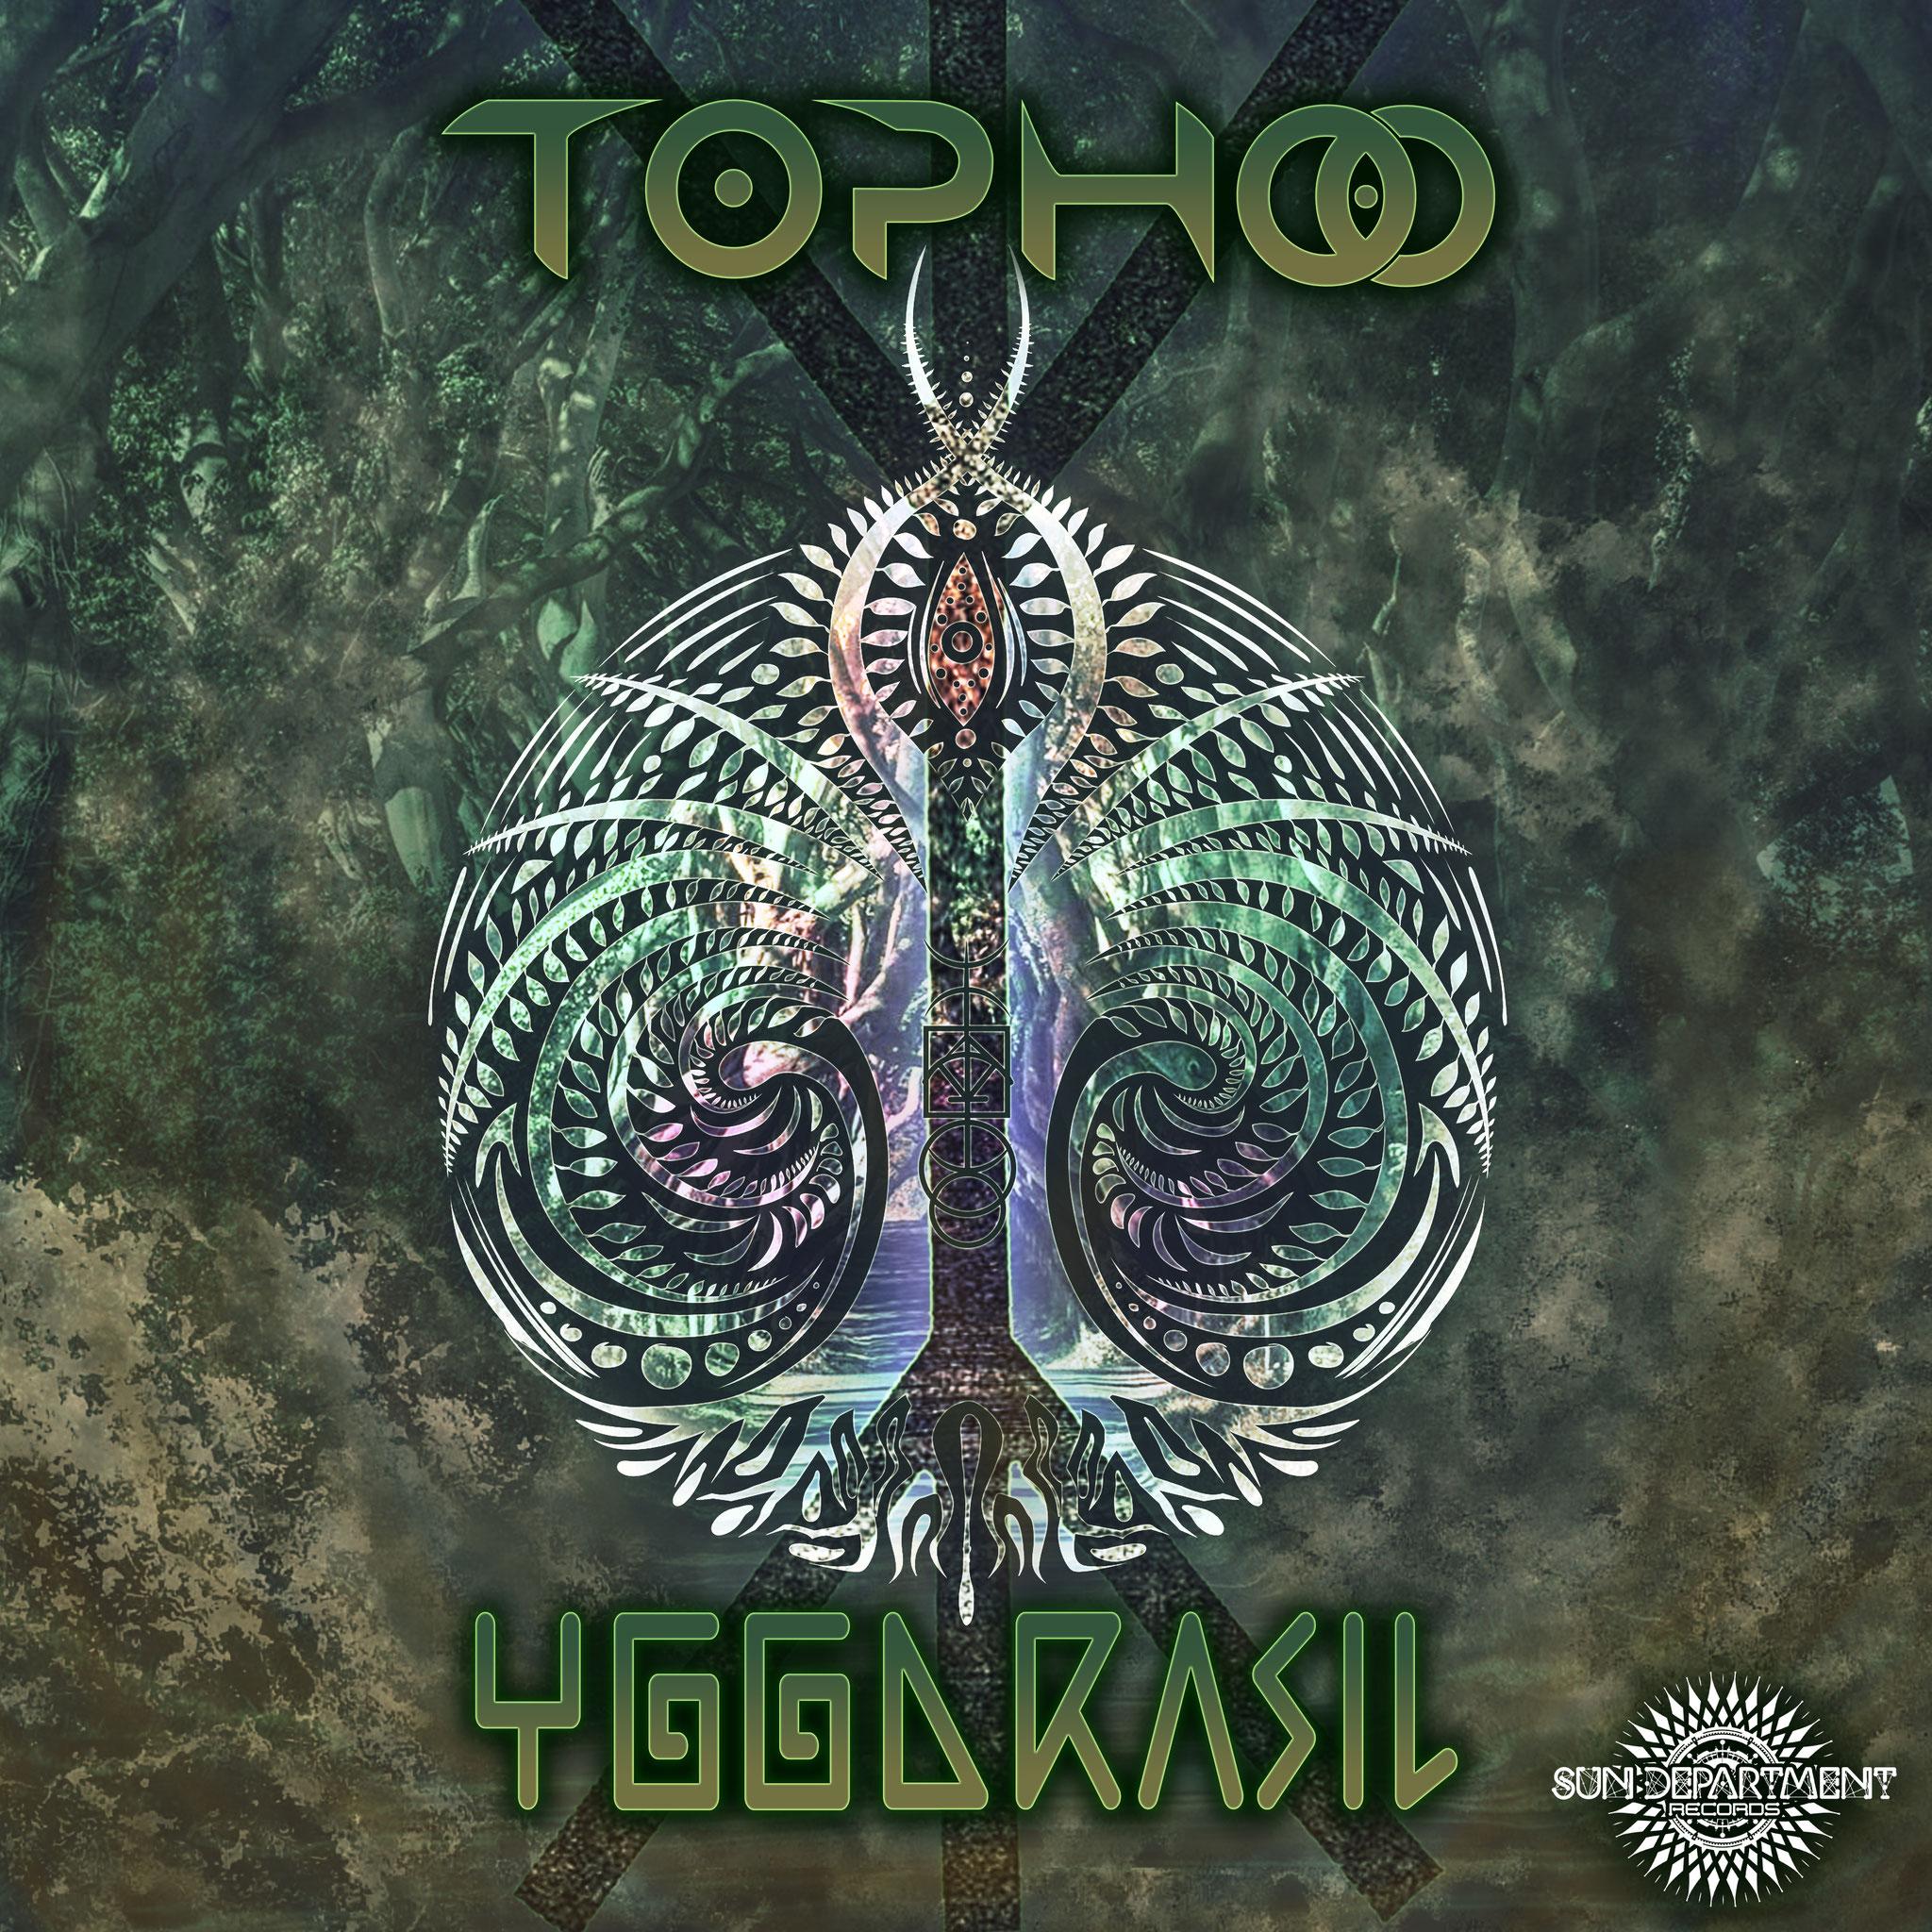 Tophoo - Yggdrasil